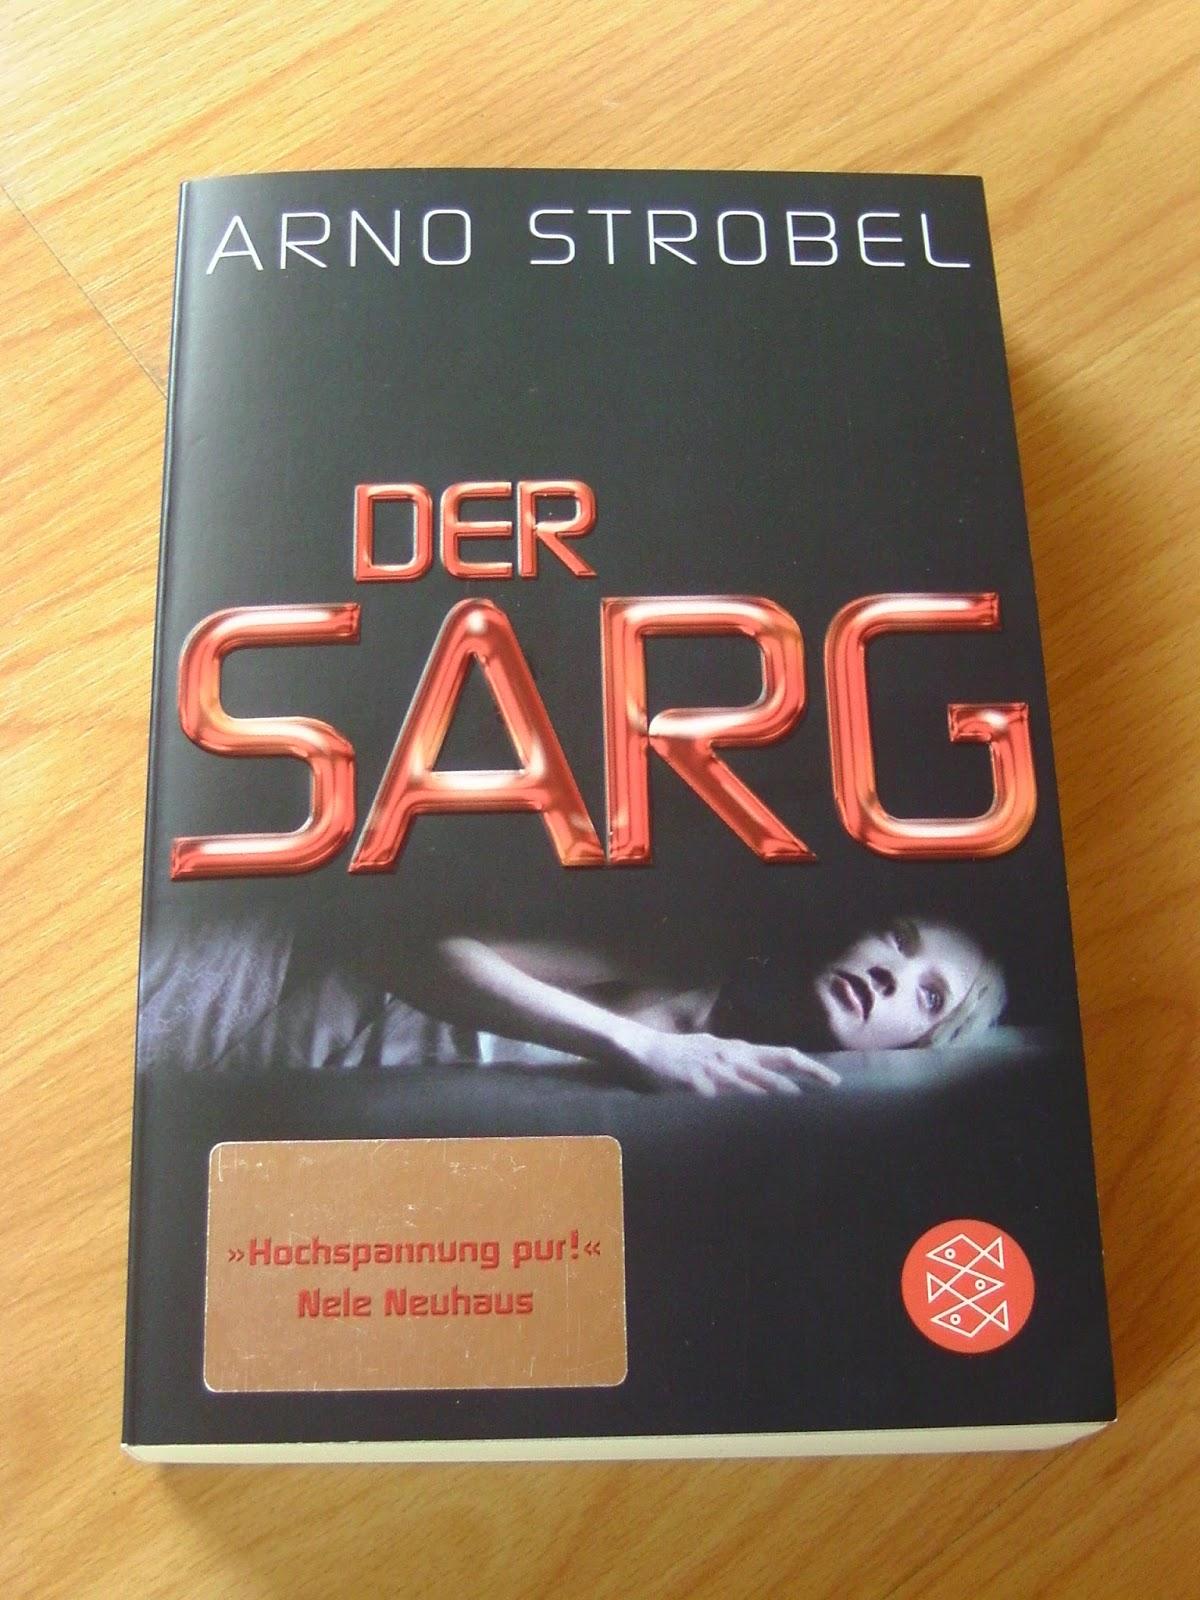 http://www.amazon.de/Sarg-Psychothriller-Arno-Strobel/dp/3596191025/ref=sr_1_1?s=books&ie=UTF8&qid=1424039571&sr=1-1&keywords=der+sarg